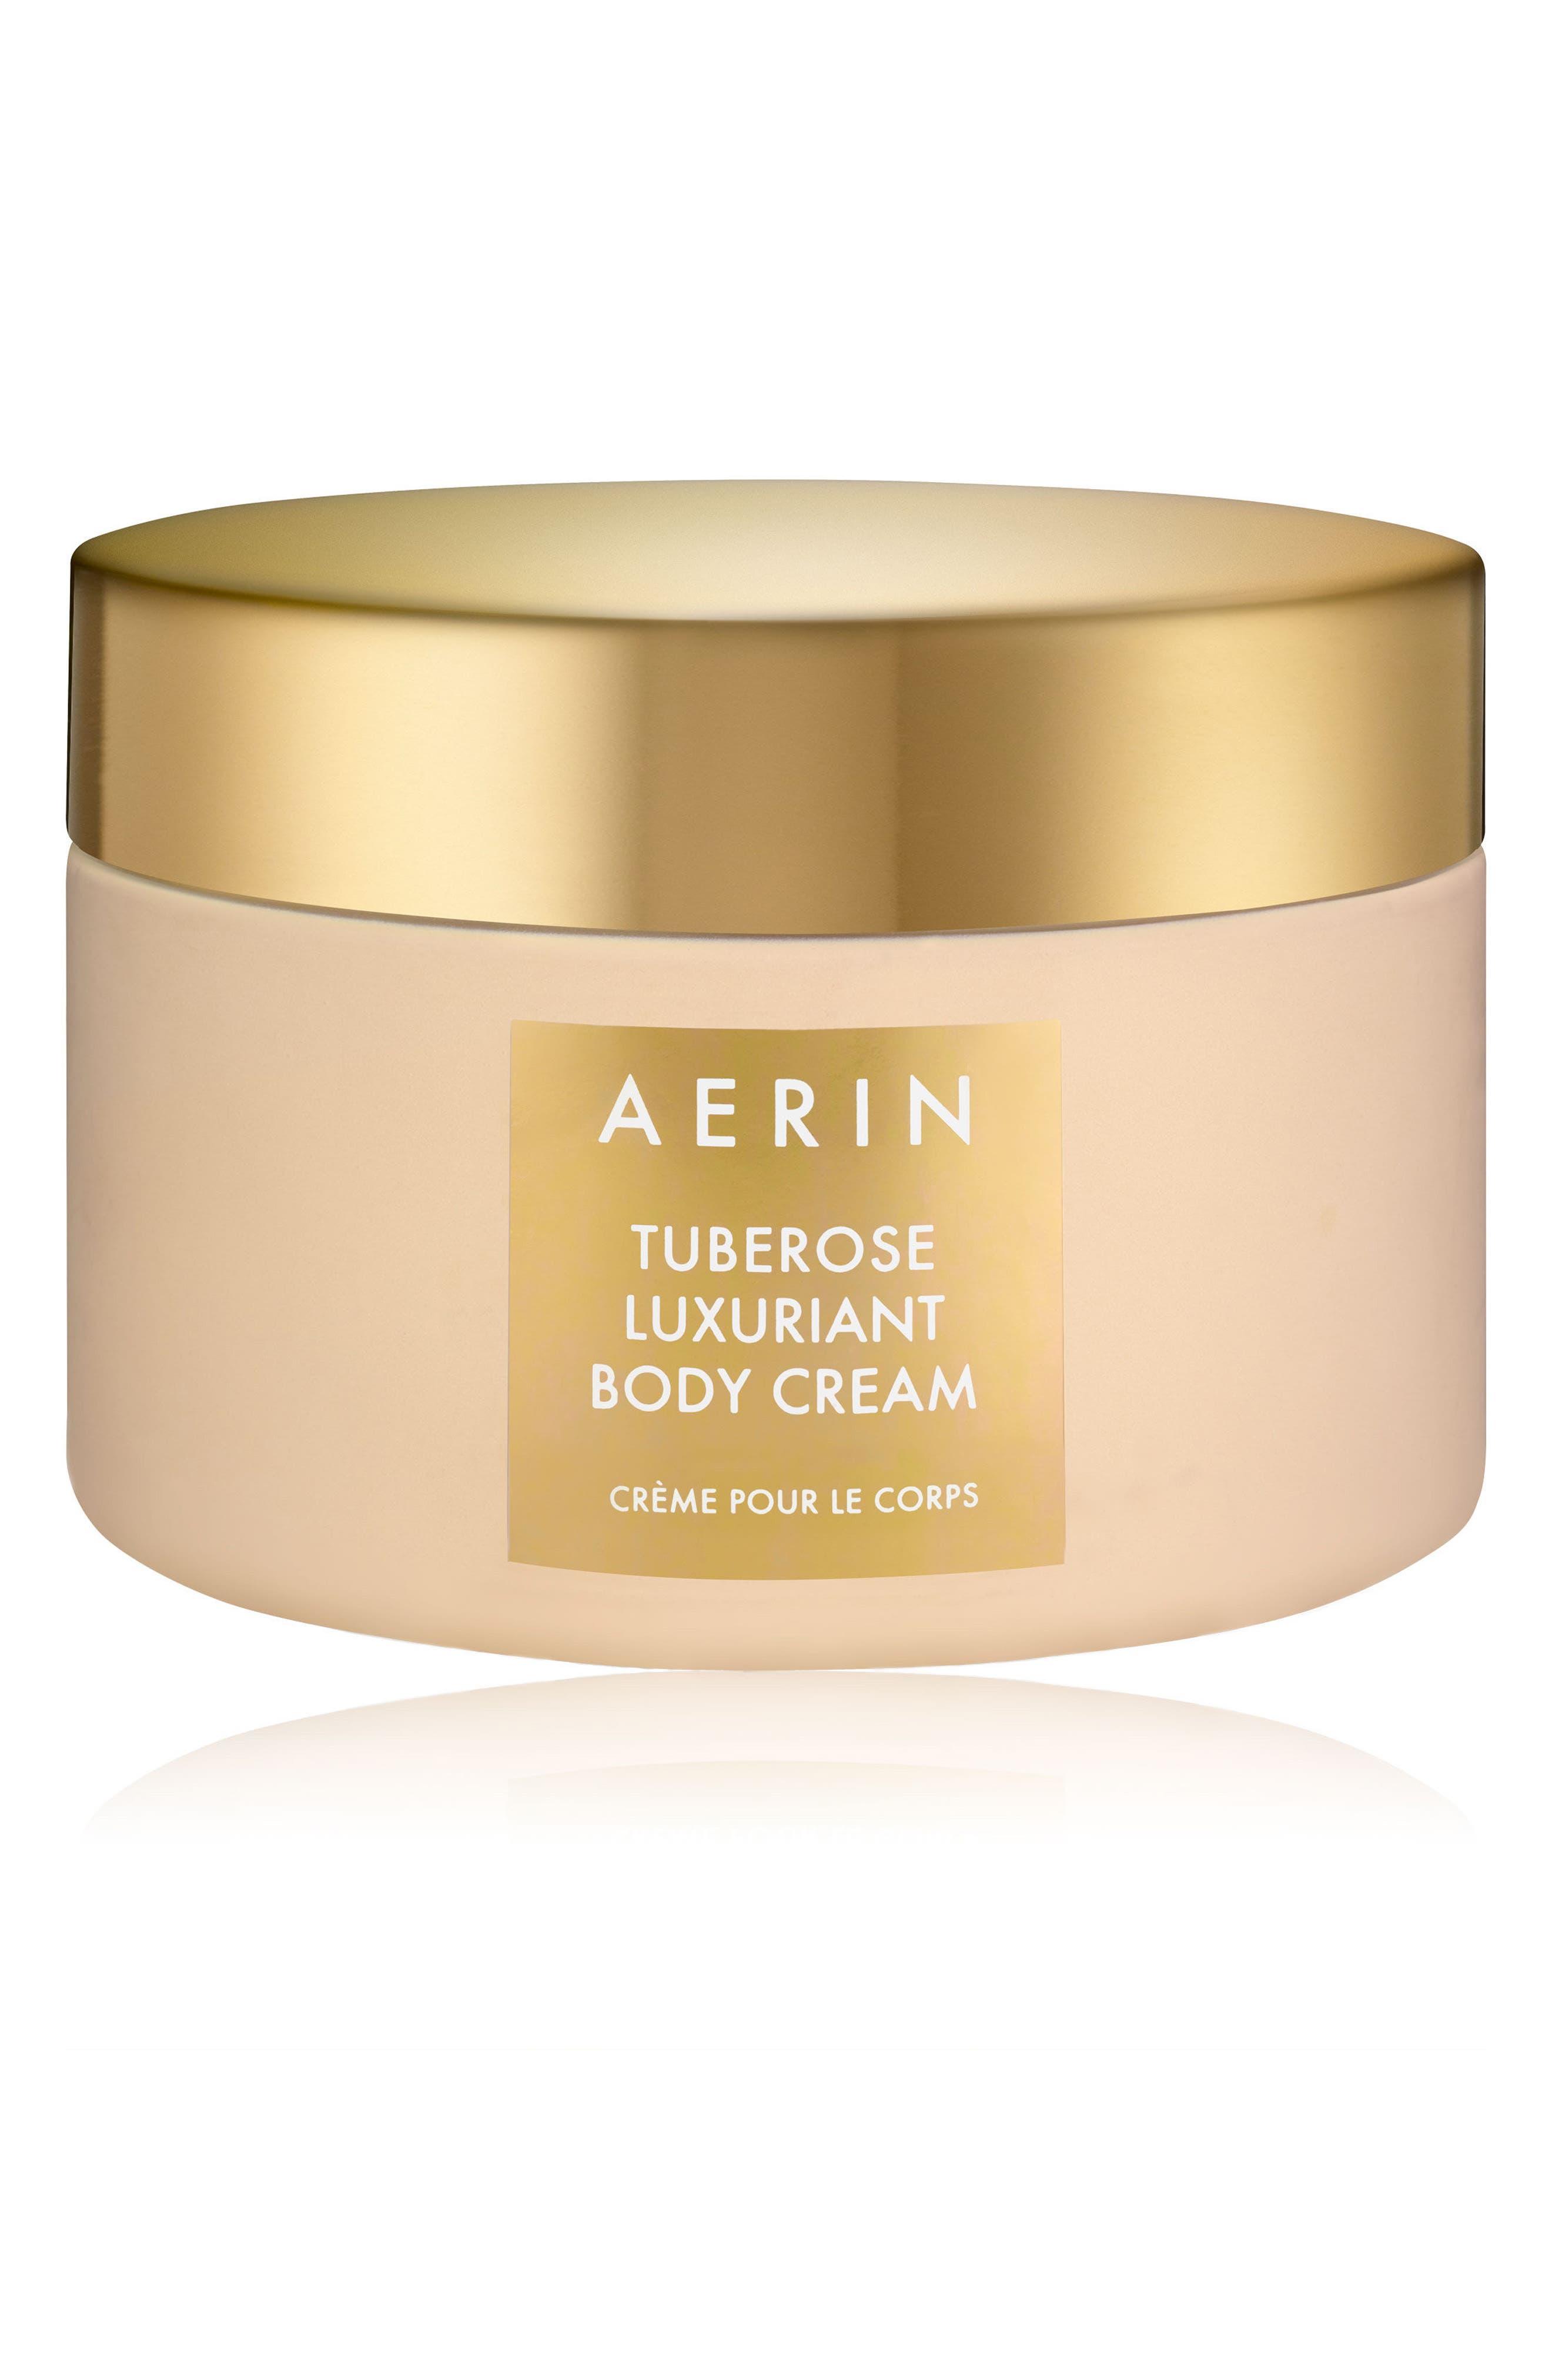 AERIN Beauty Tuberose Luxuriant Body Cream,                             Main thumbnail 1, color,